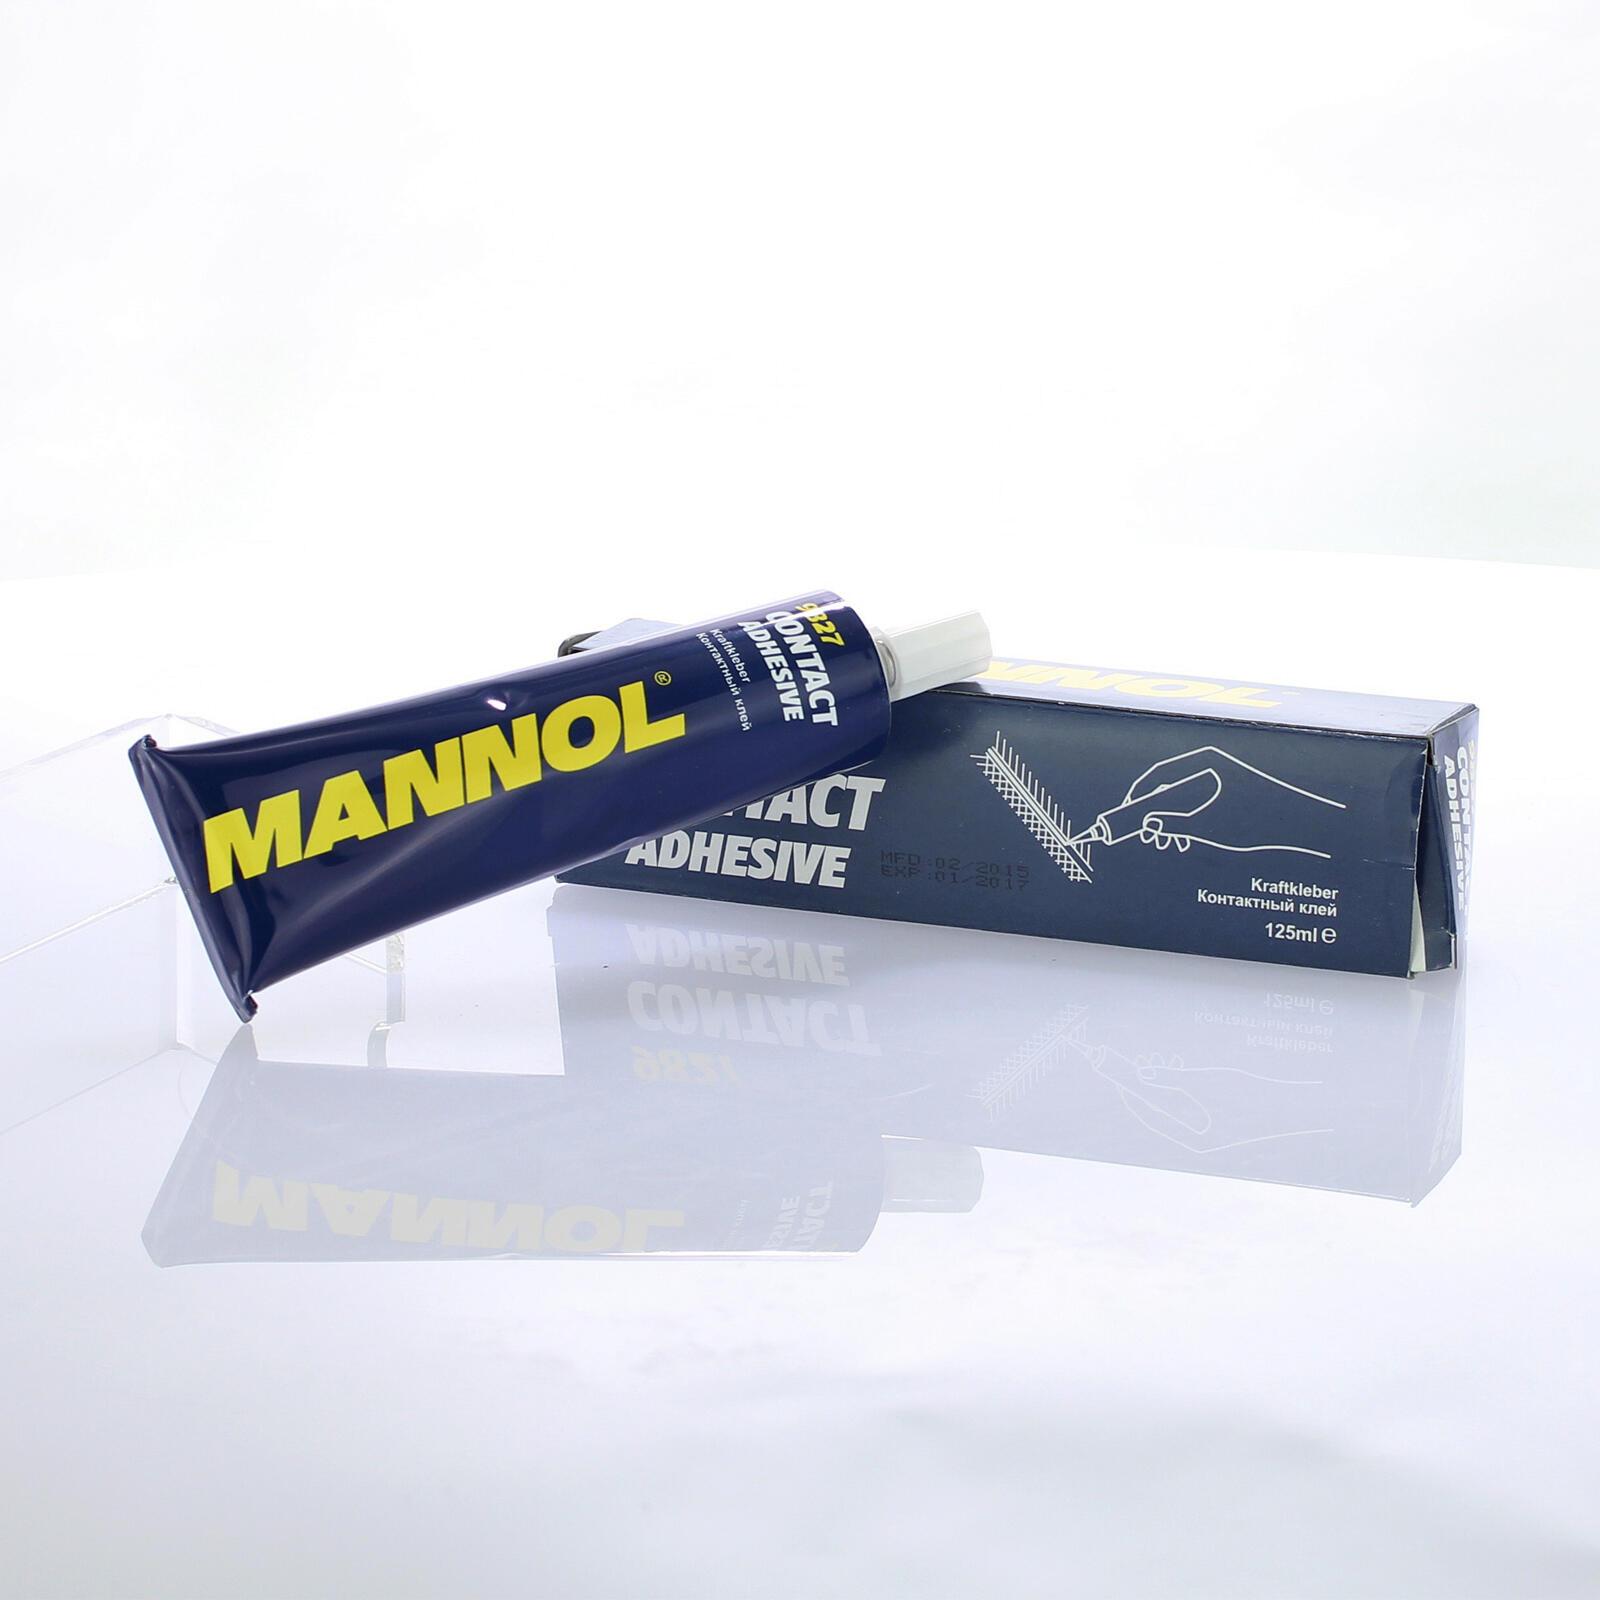 Mannol Contact Adhesive 125ml Universalkleber für Gummi Leder Filz Metall